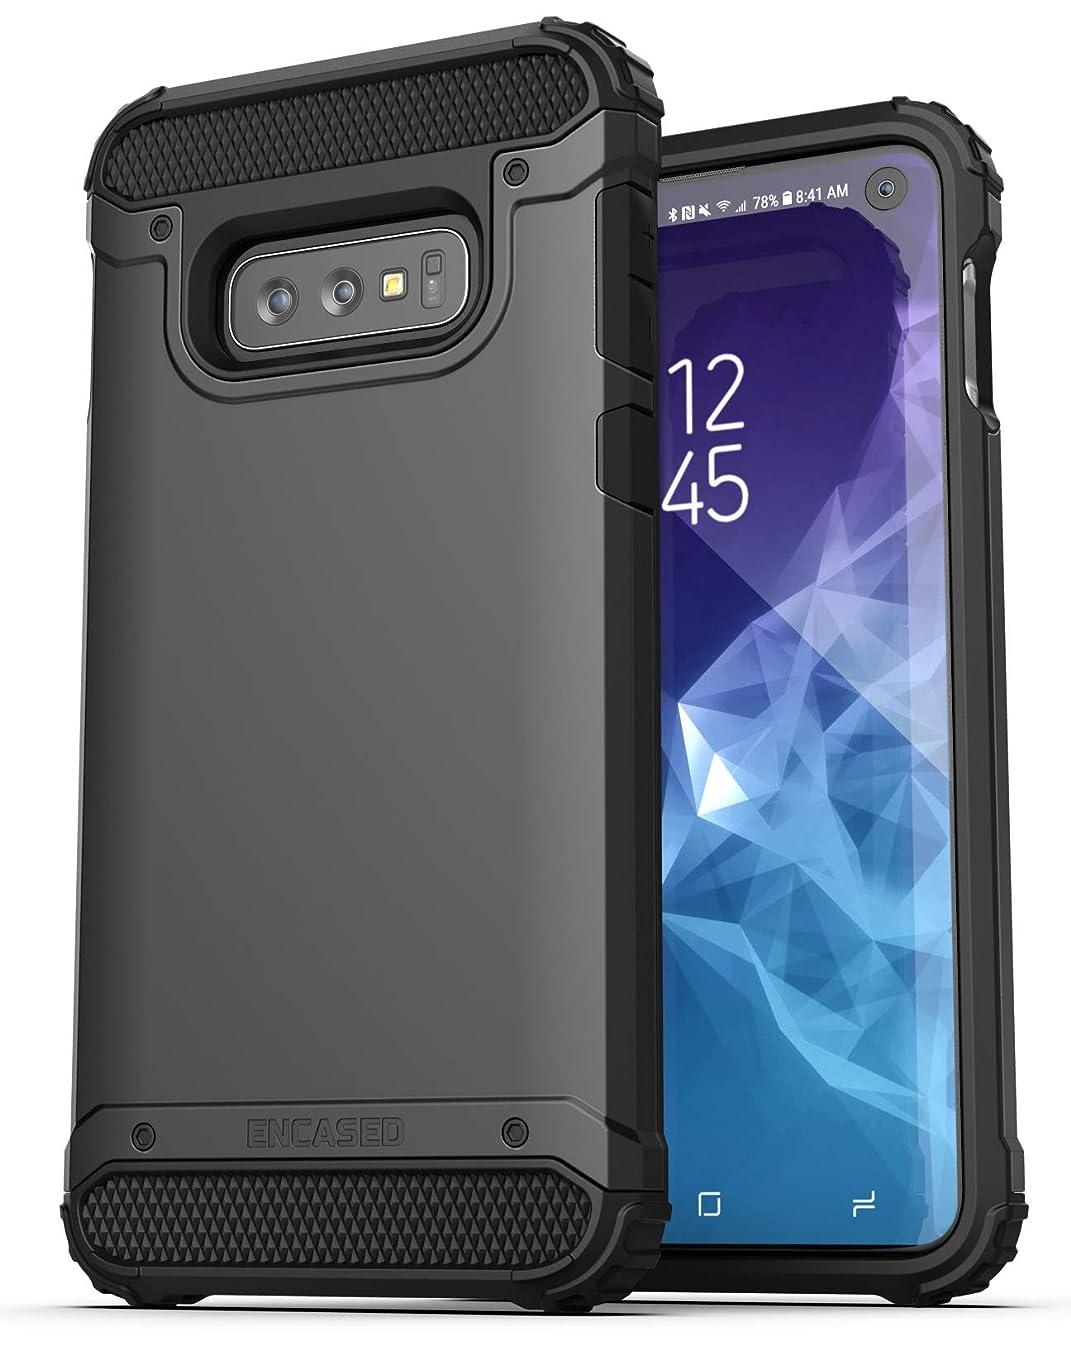 Encased Heavy Duty Galaxy S10e Case (2019 Scorpio Series) Military Grade Rugged Phone Protection Cover (for Samsung Galaxy S10 E) Black